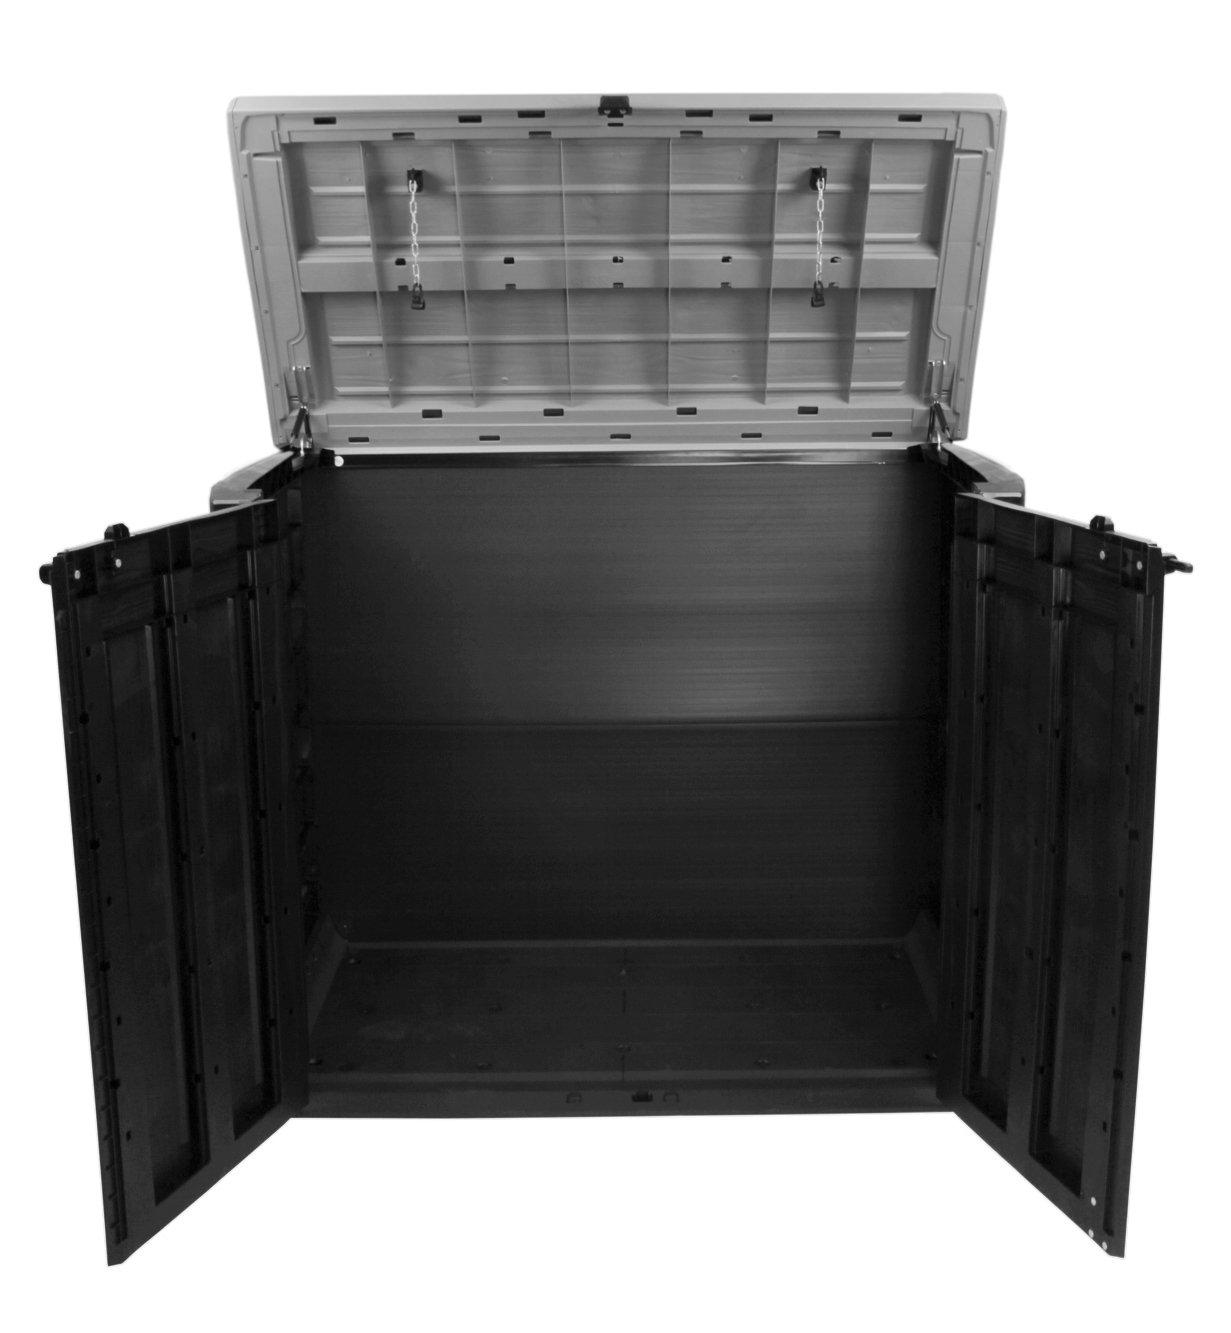 Ondis24 Keter Store it out MAX Jardín Caja schöner-wohnen24 Dispositivo Caja Caseta para contenedores 2 x 240 litros: Amazon.es: Jardín